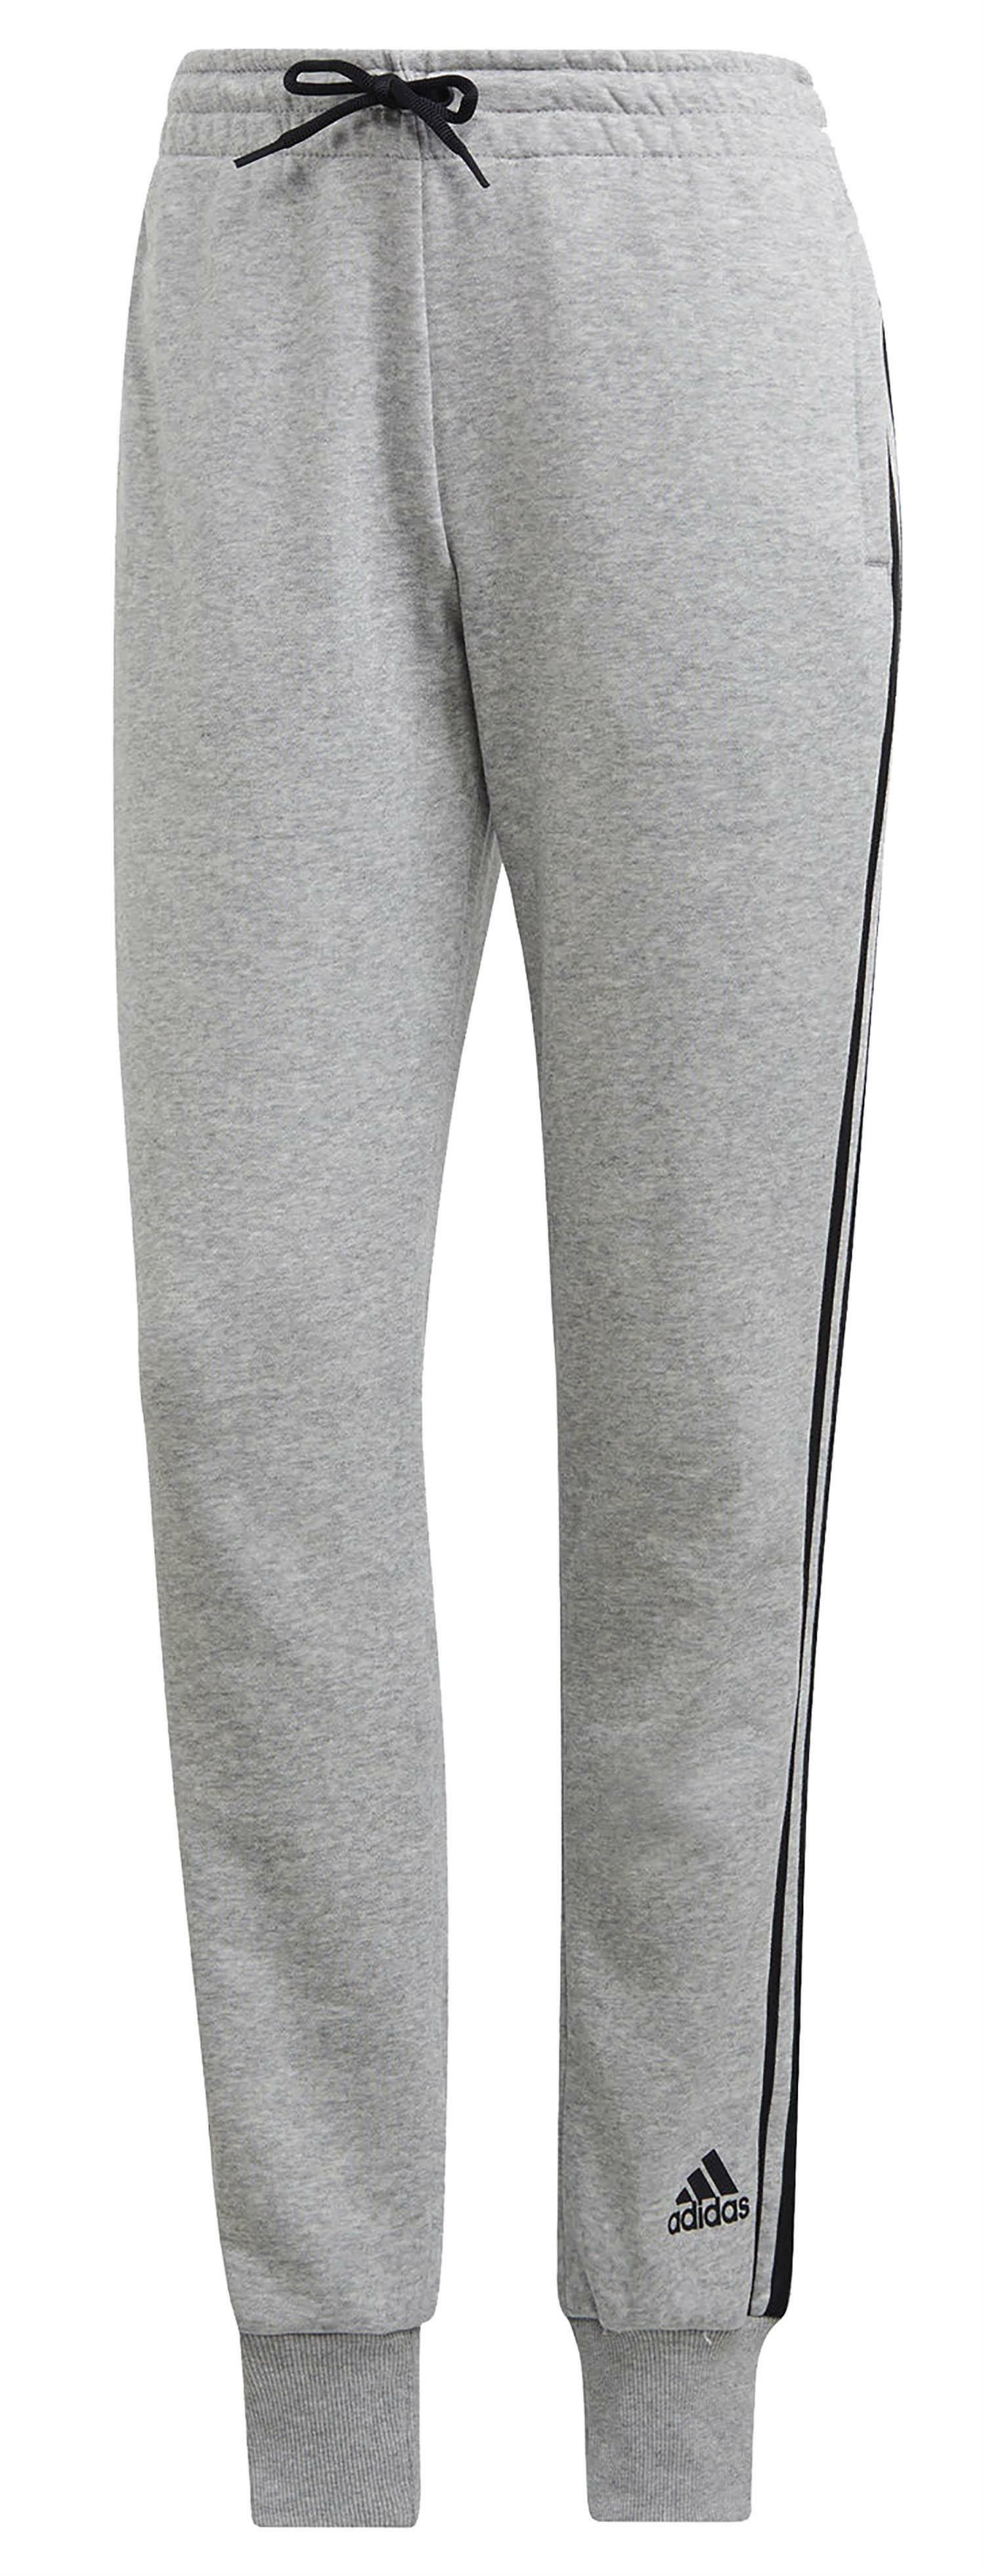 yoga pantaloni donna adidas